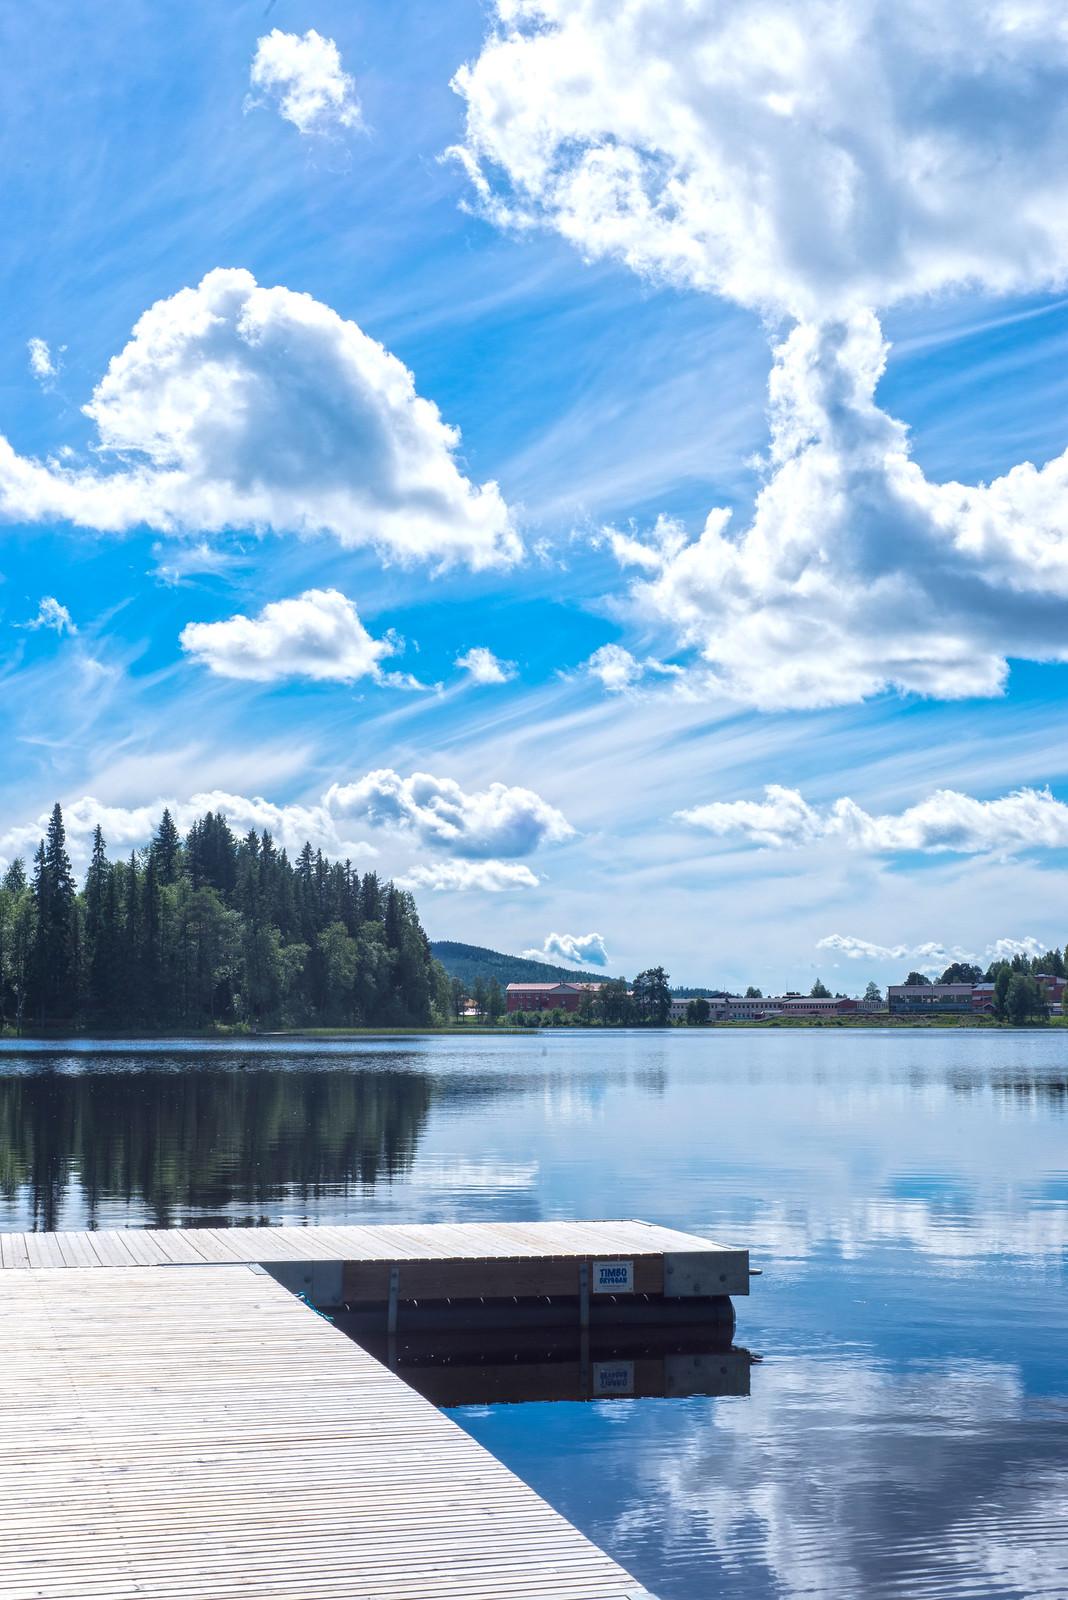 Nordic lake